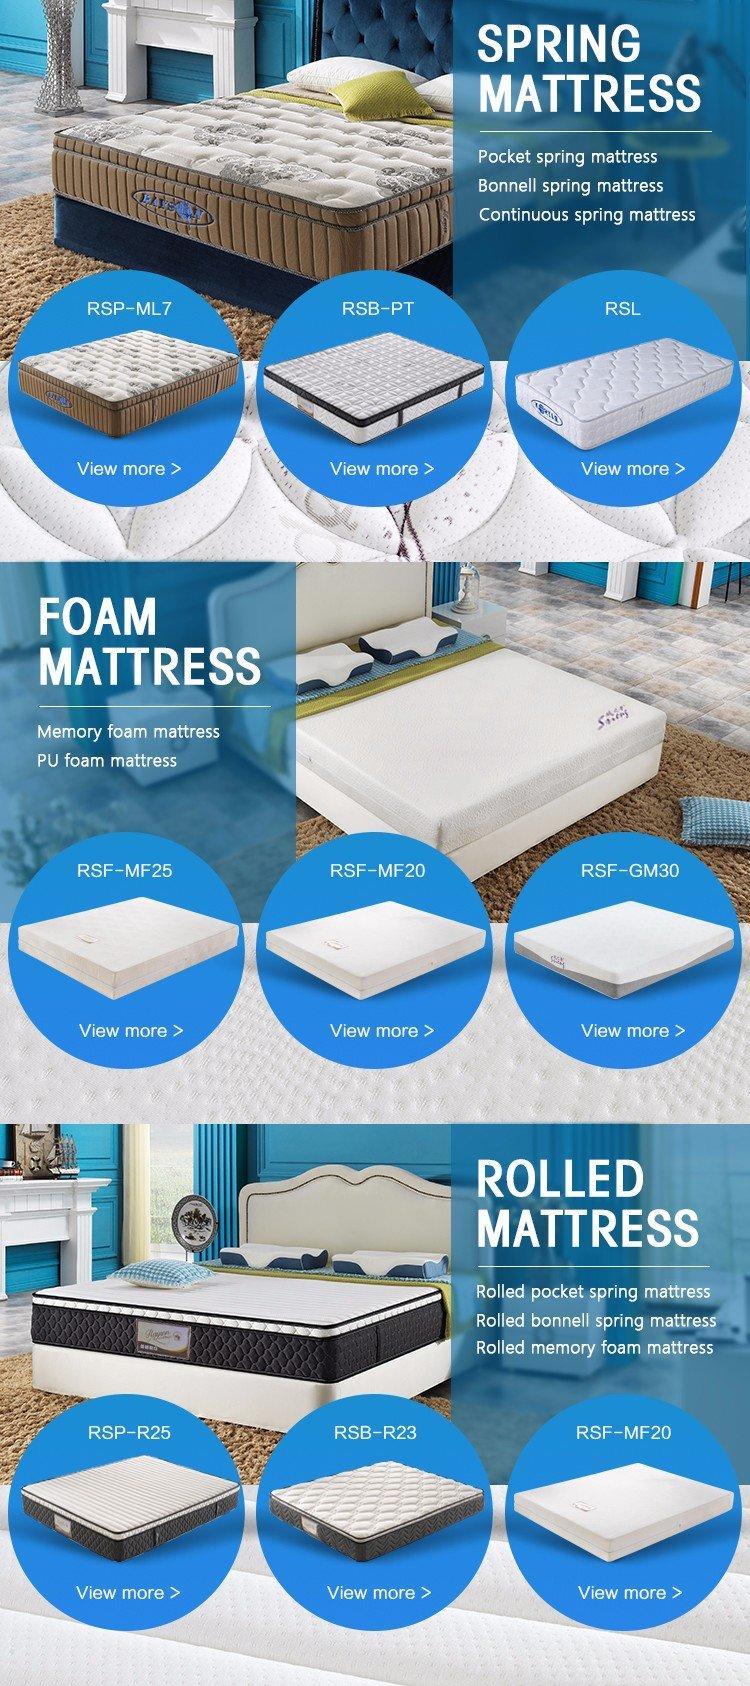 Rayson Mattress foam 12 inch memory foam mattress manufacturers